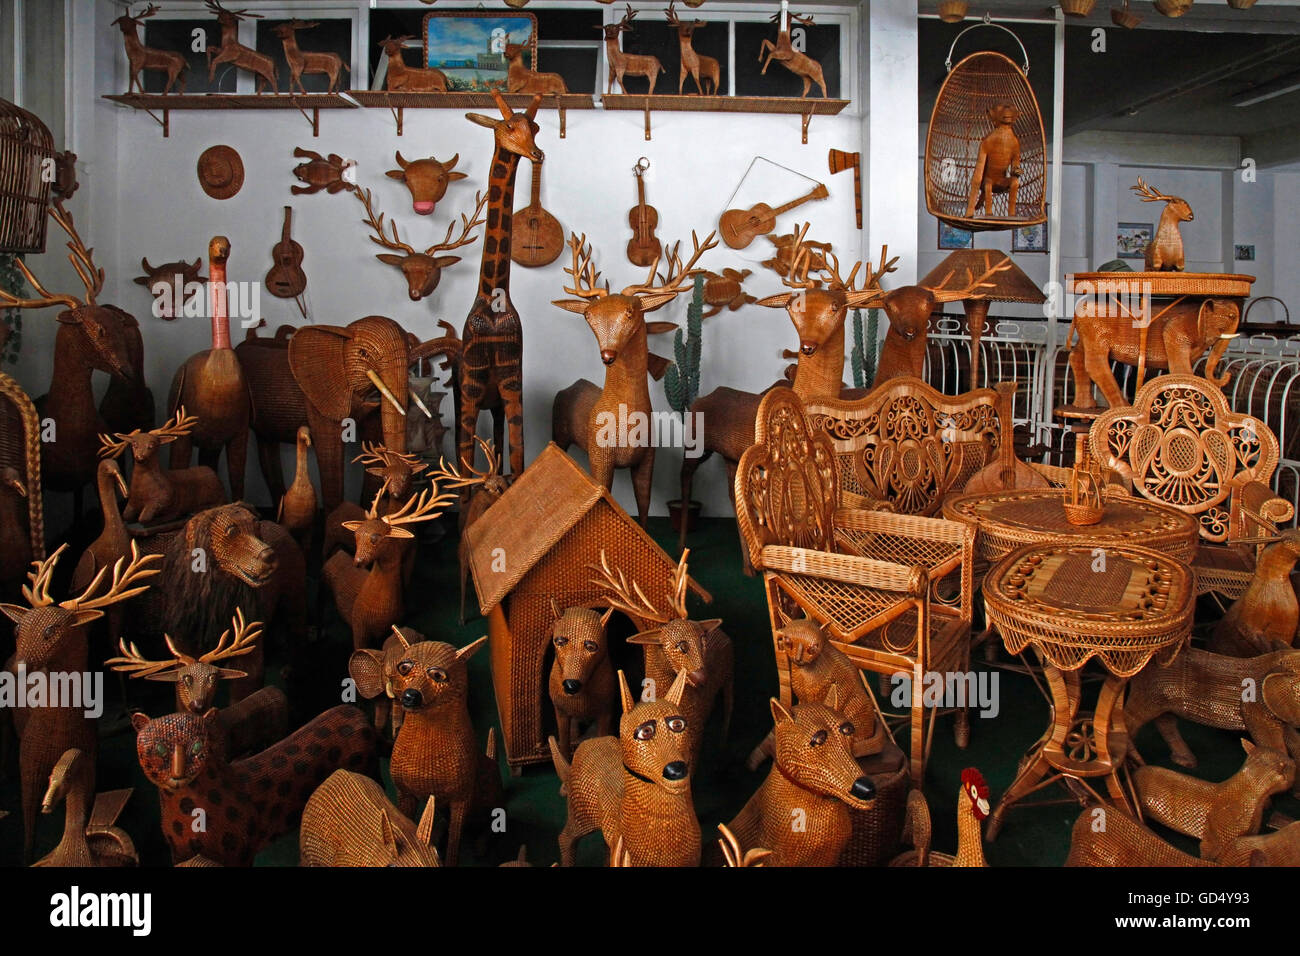 Basket-making, Camacha, Island of Madeira, Portugal - Stock Image